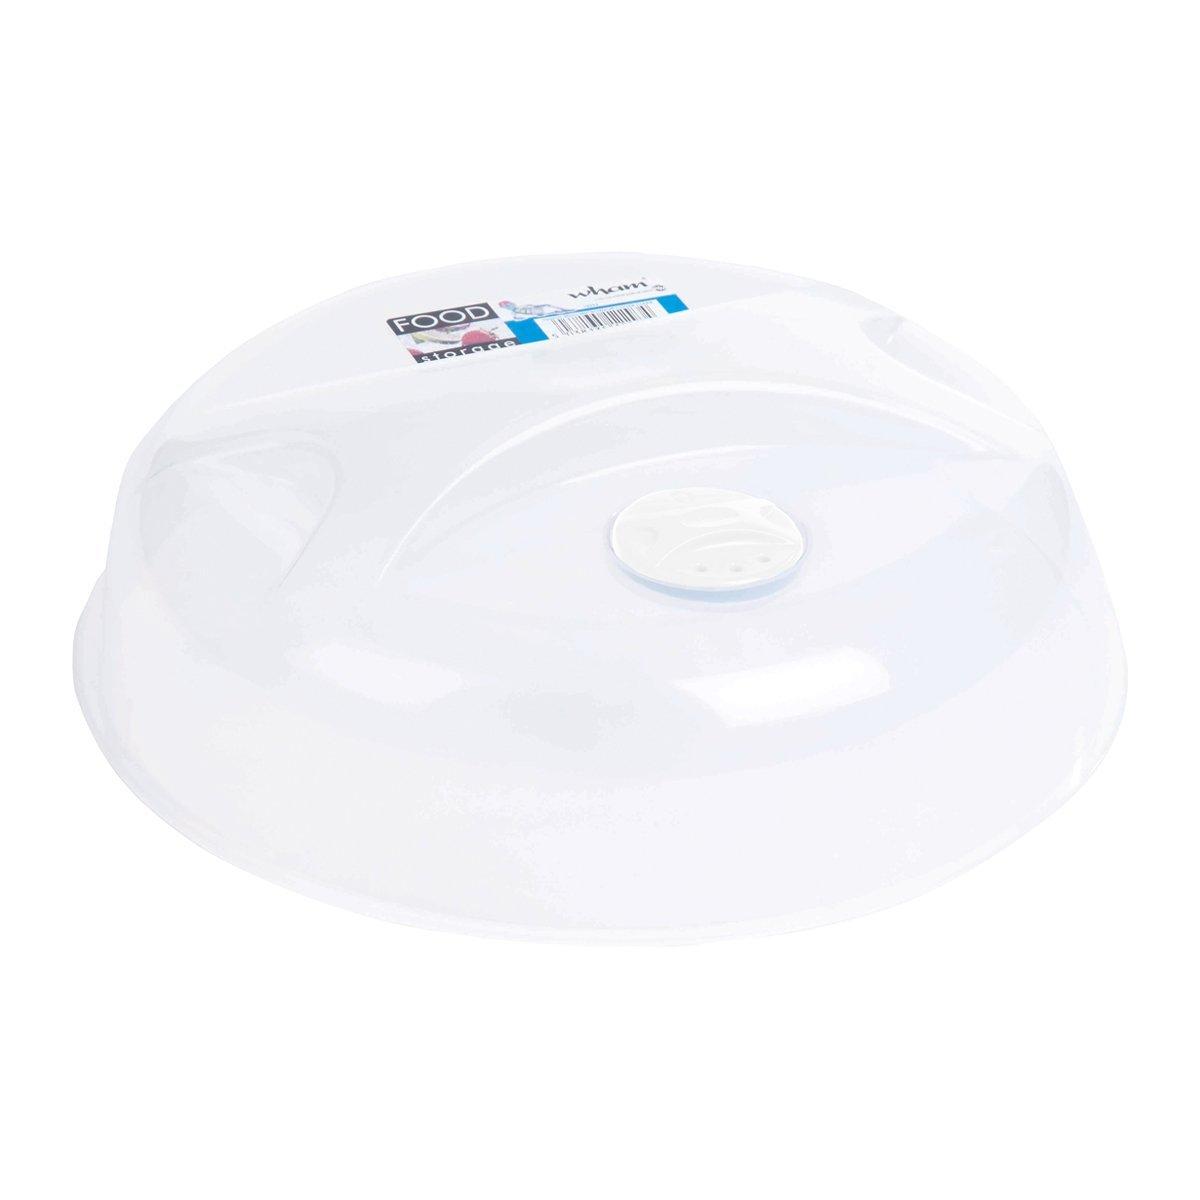 Wham tapa para alimentos microondas/tapa de la cubierta Pw557Wm